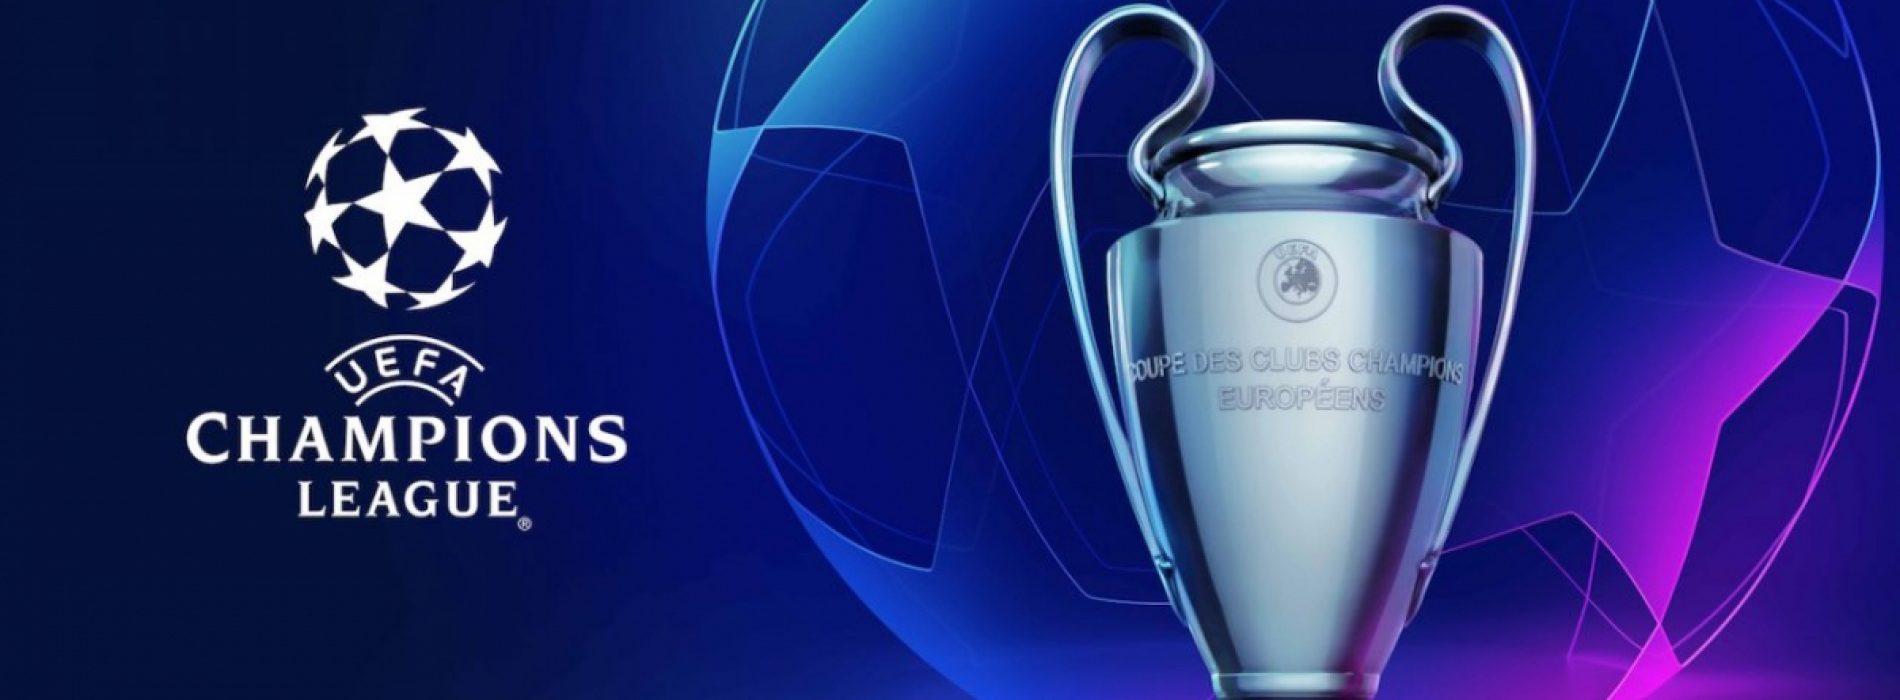 Liverpool-Barcellona: Van Dijk in dubbio, Salah e Firmino assenti